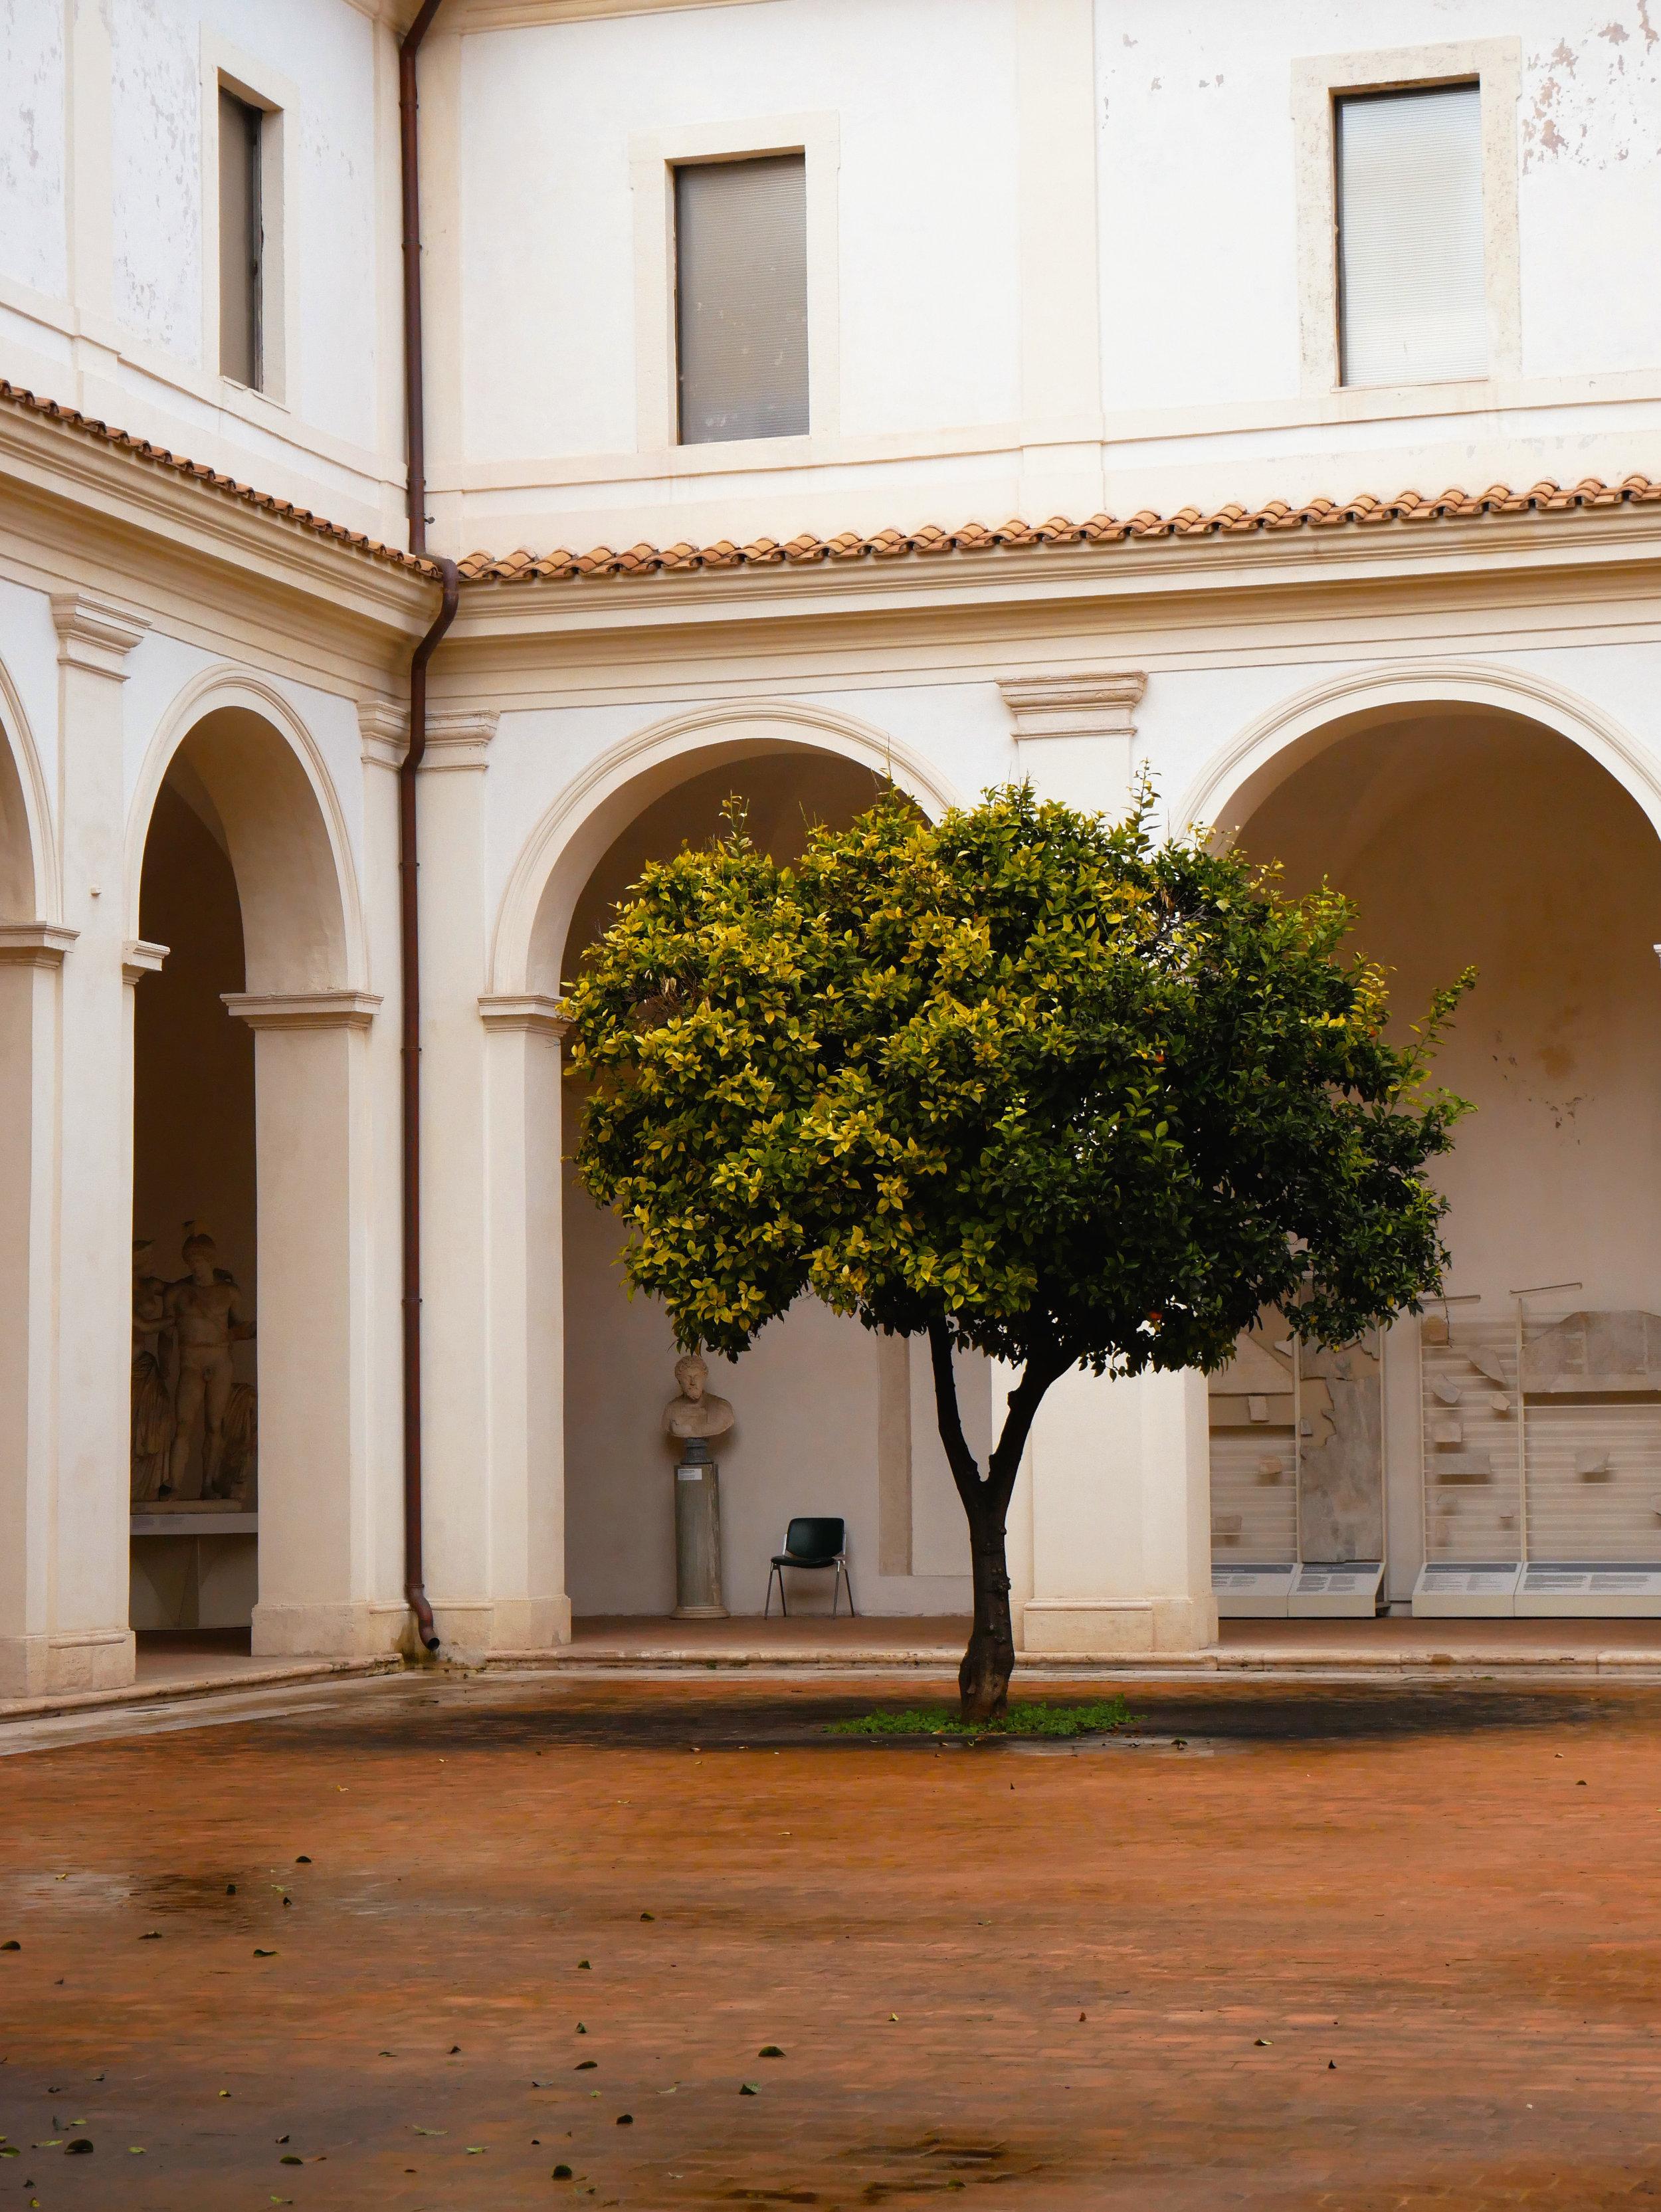 Terme Di Diocleziano, Rome